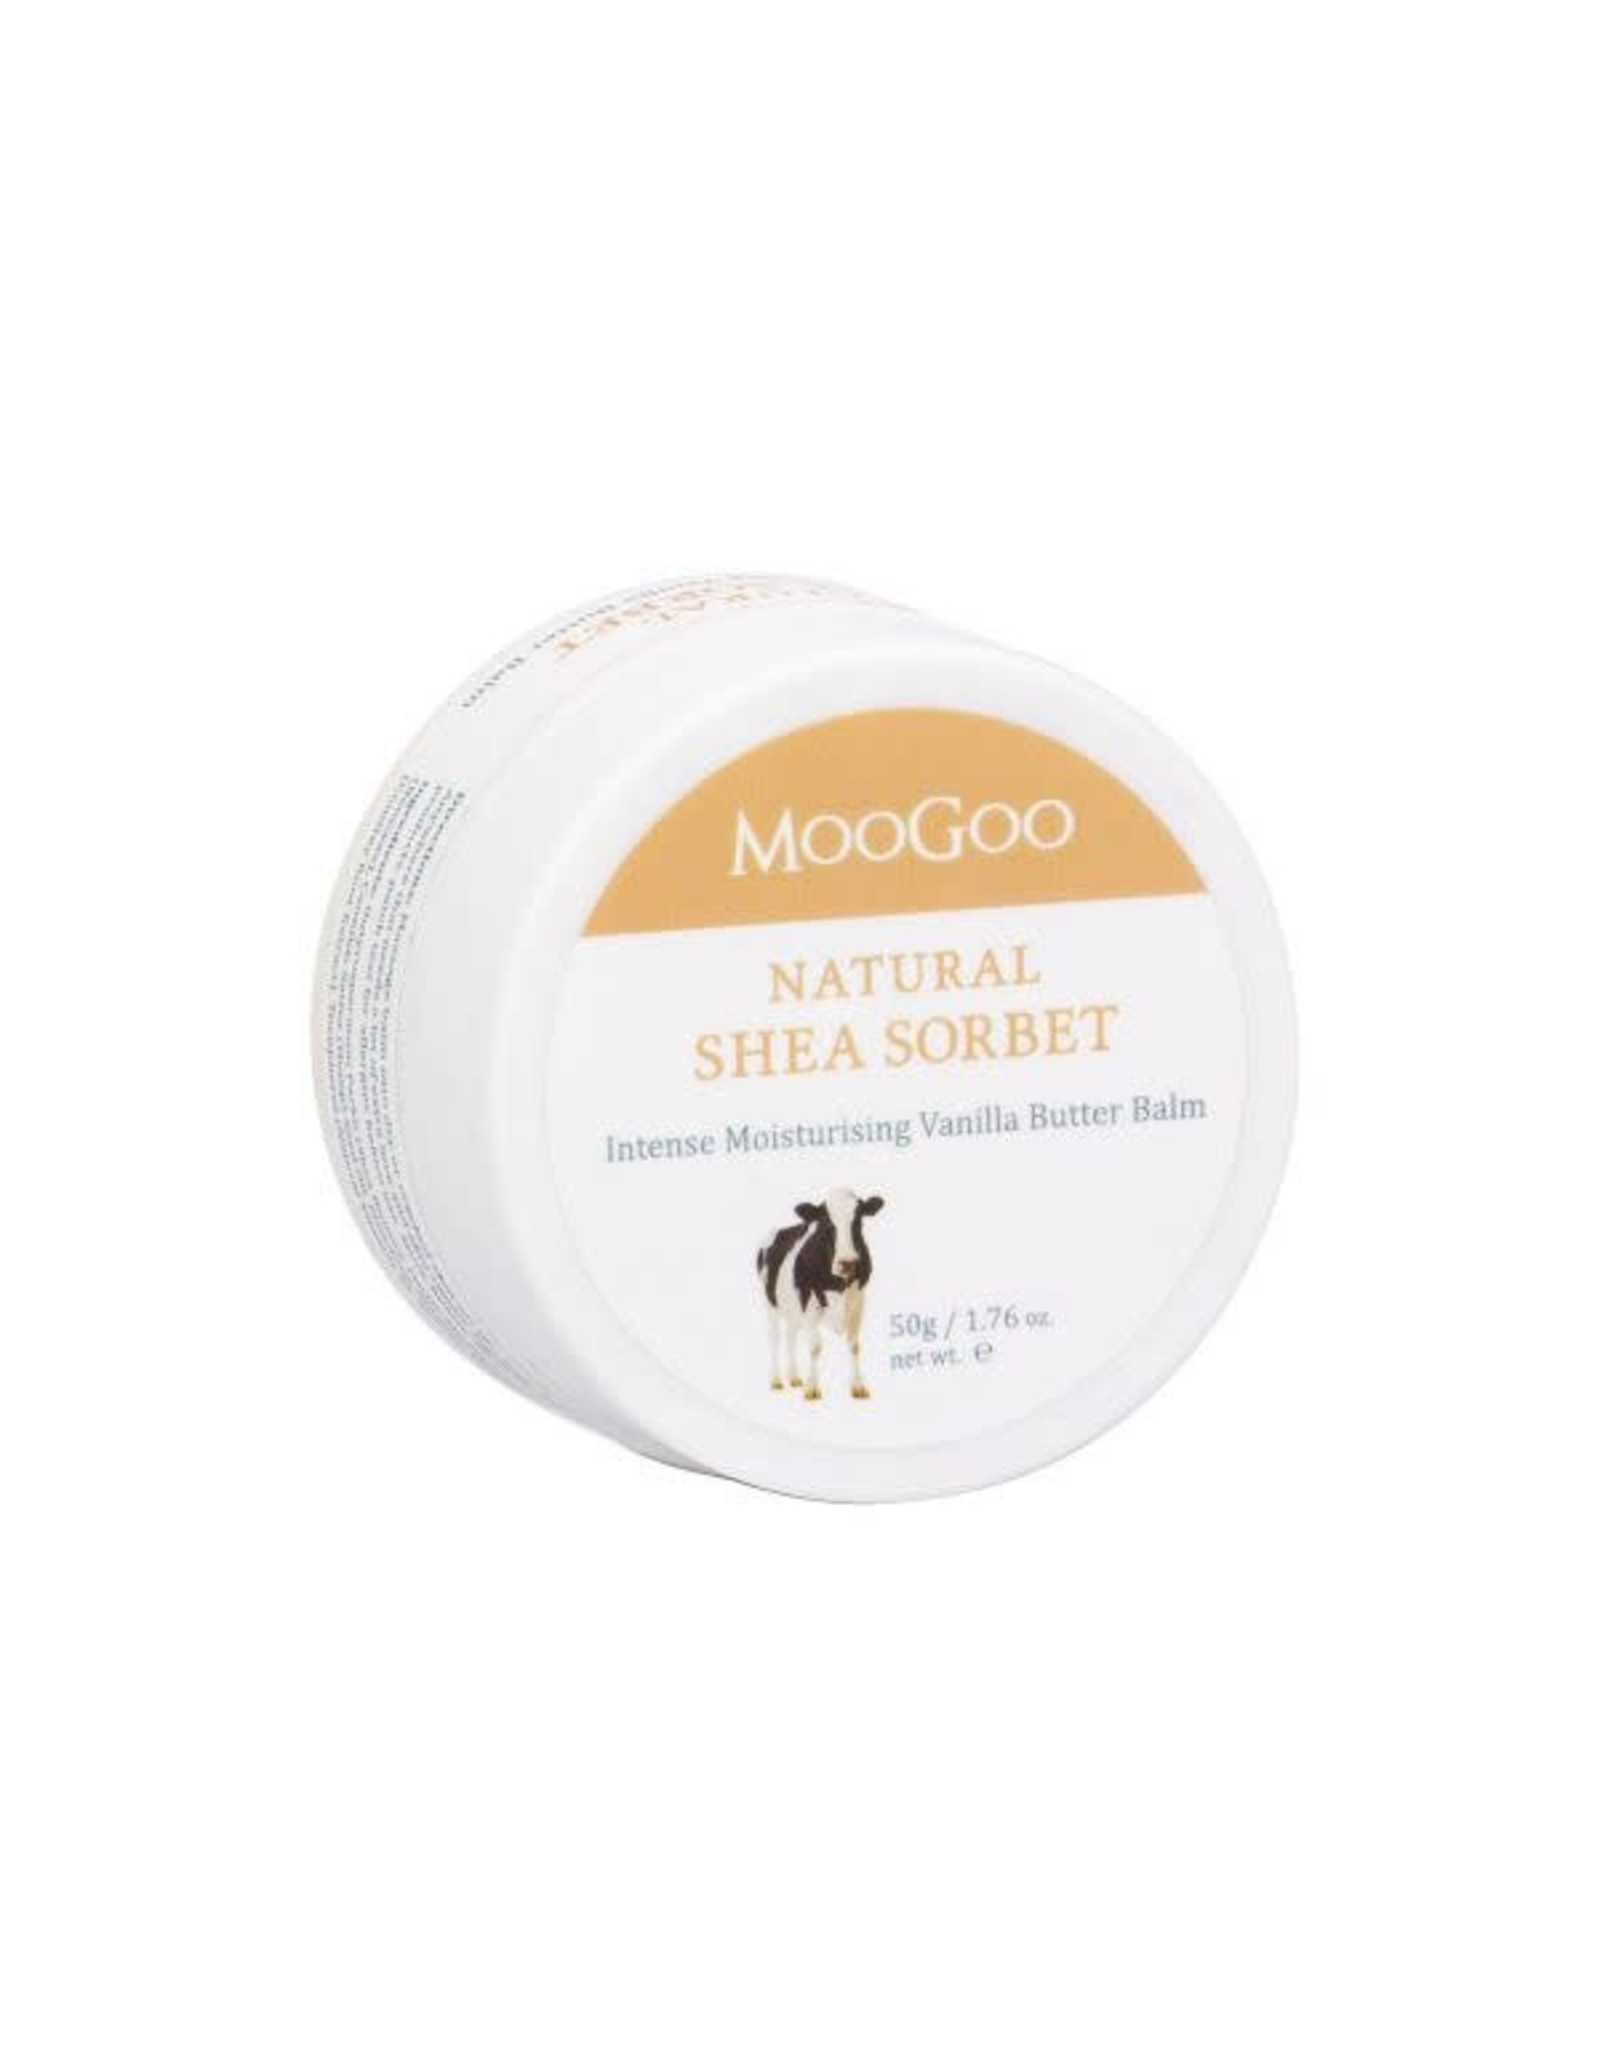 Moogoo Shea Sorbet Vanilla Butter Balm 50g